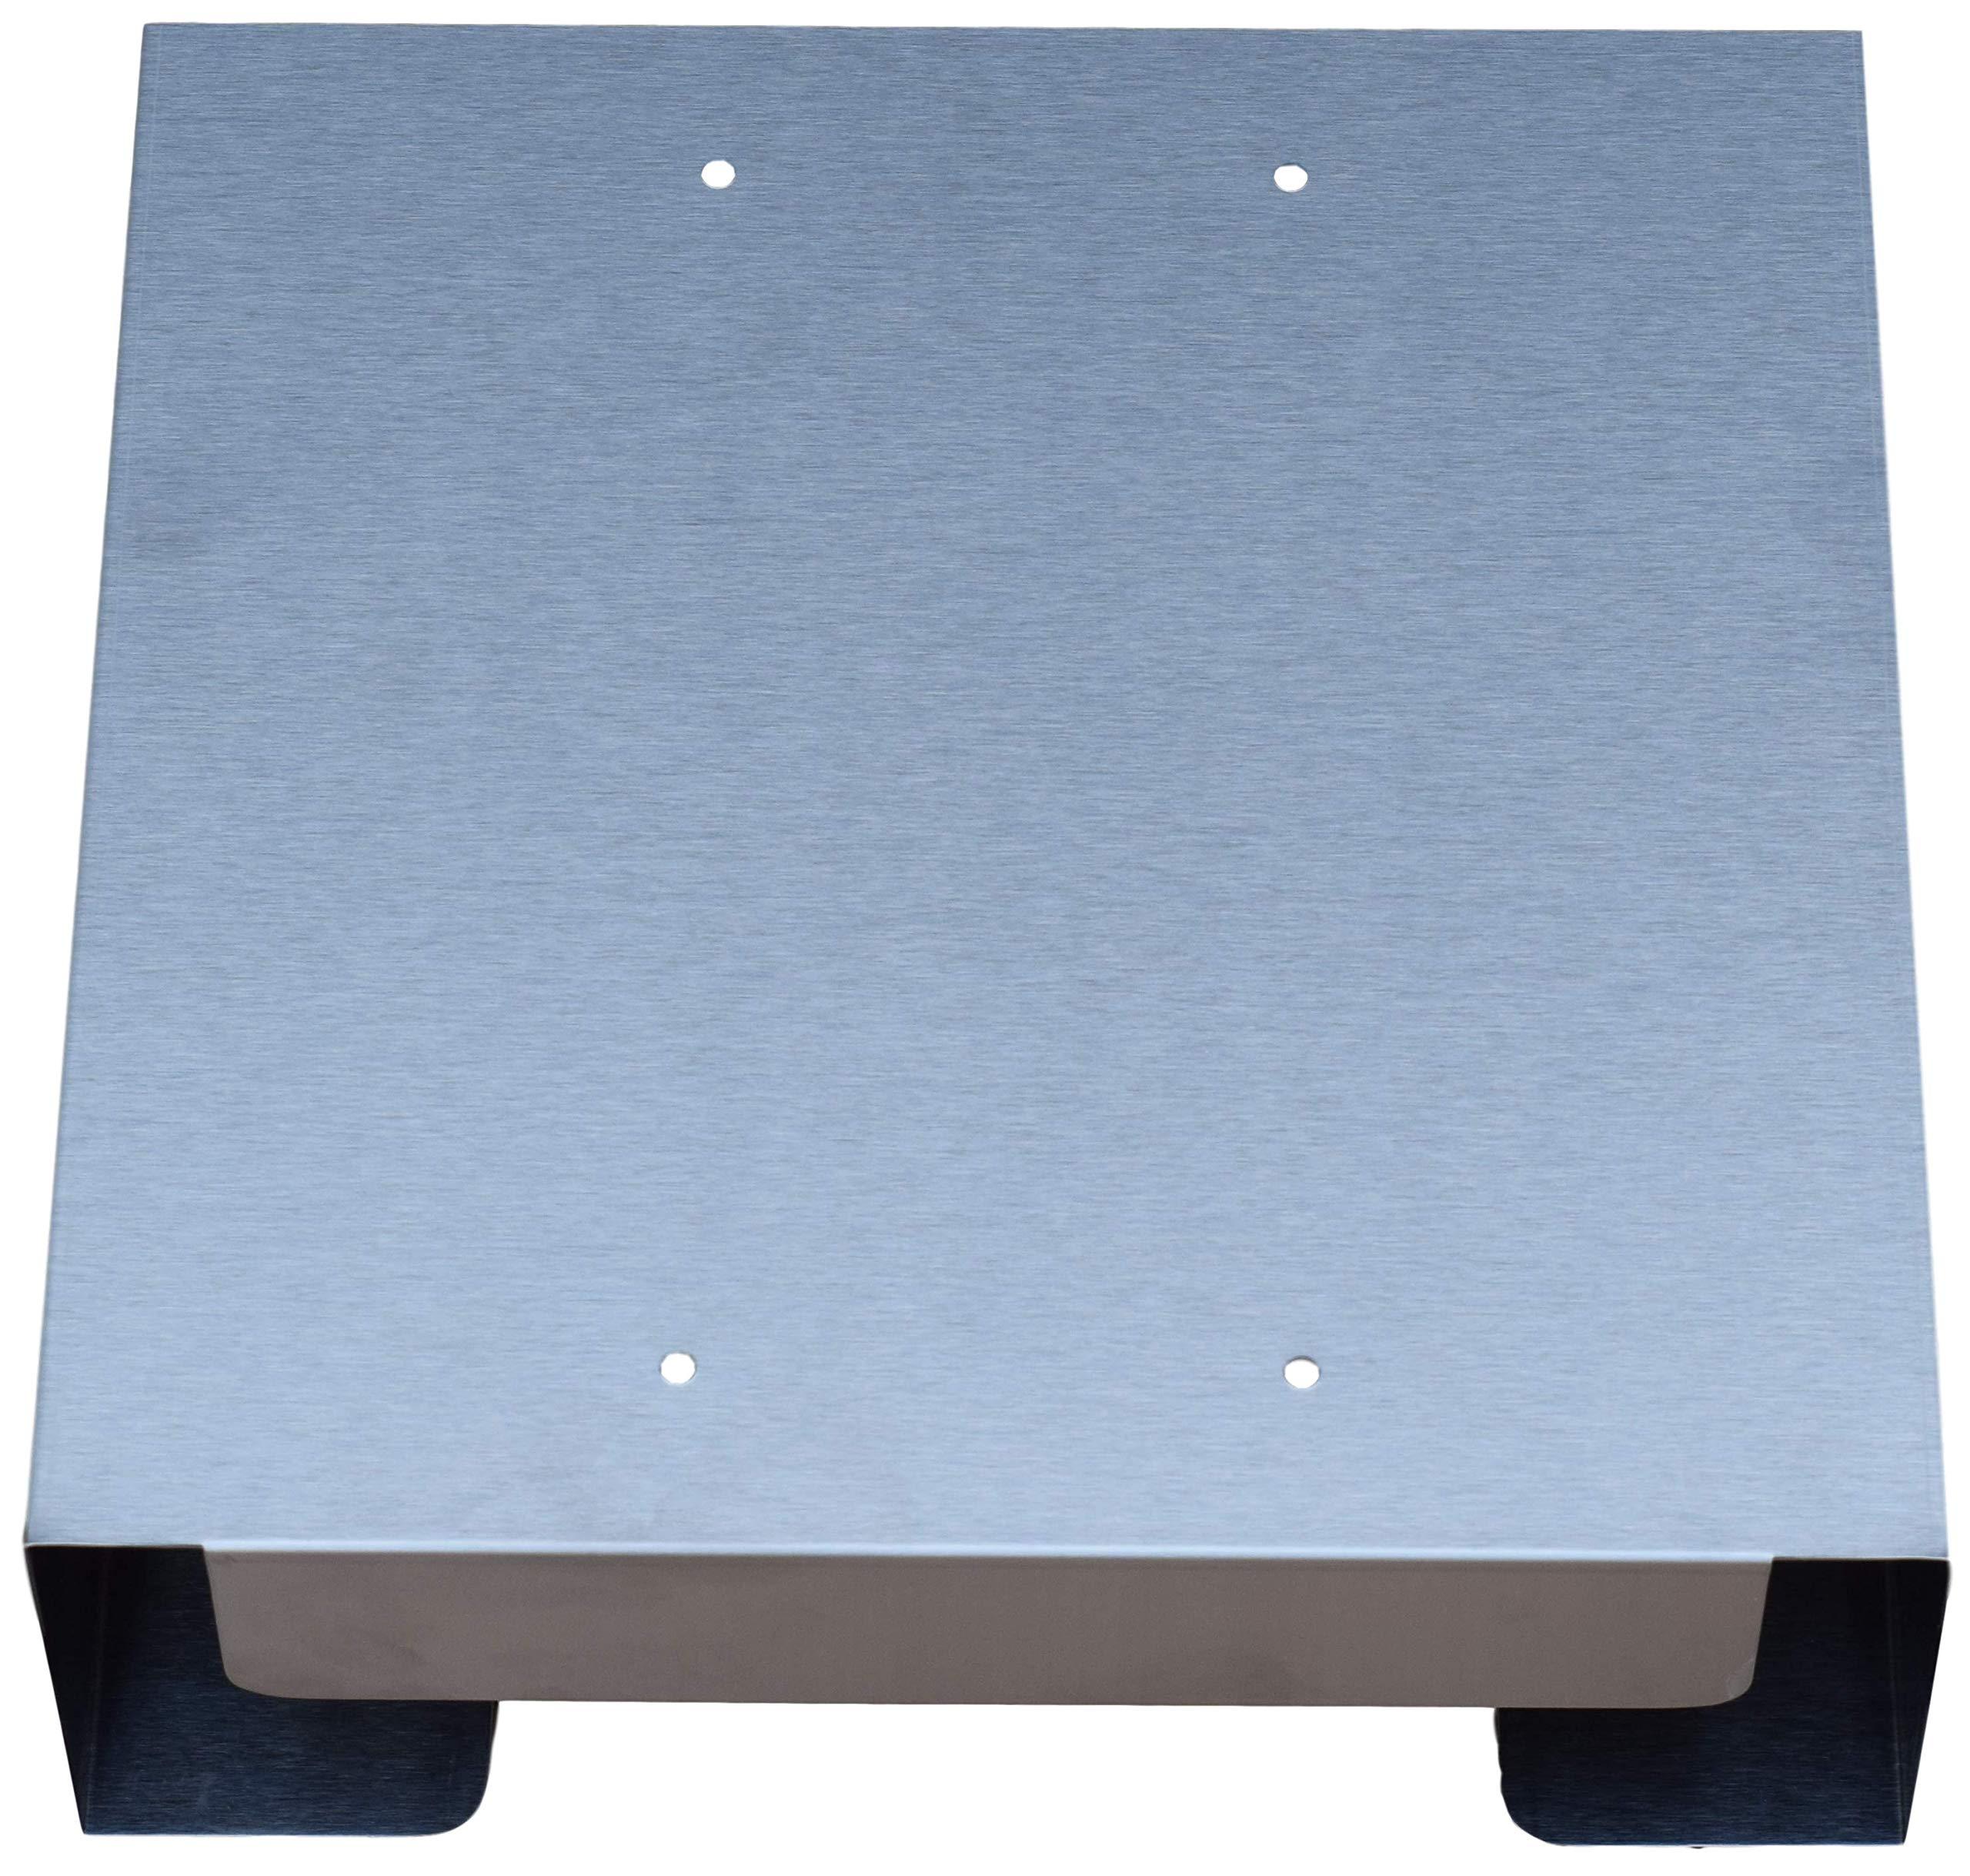 Proprietary Flash Strobe Sync PC Cord for Vivitar 283 285 285HV Flash 12